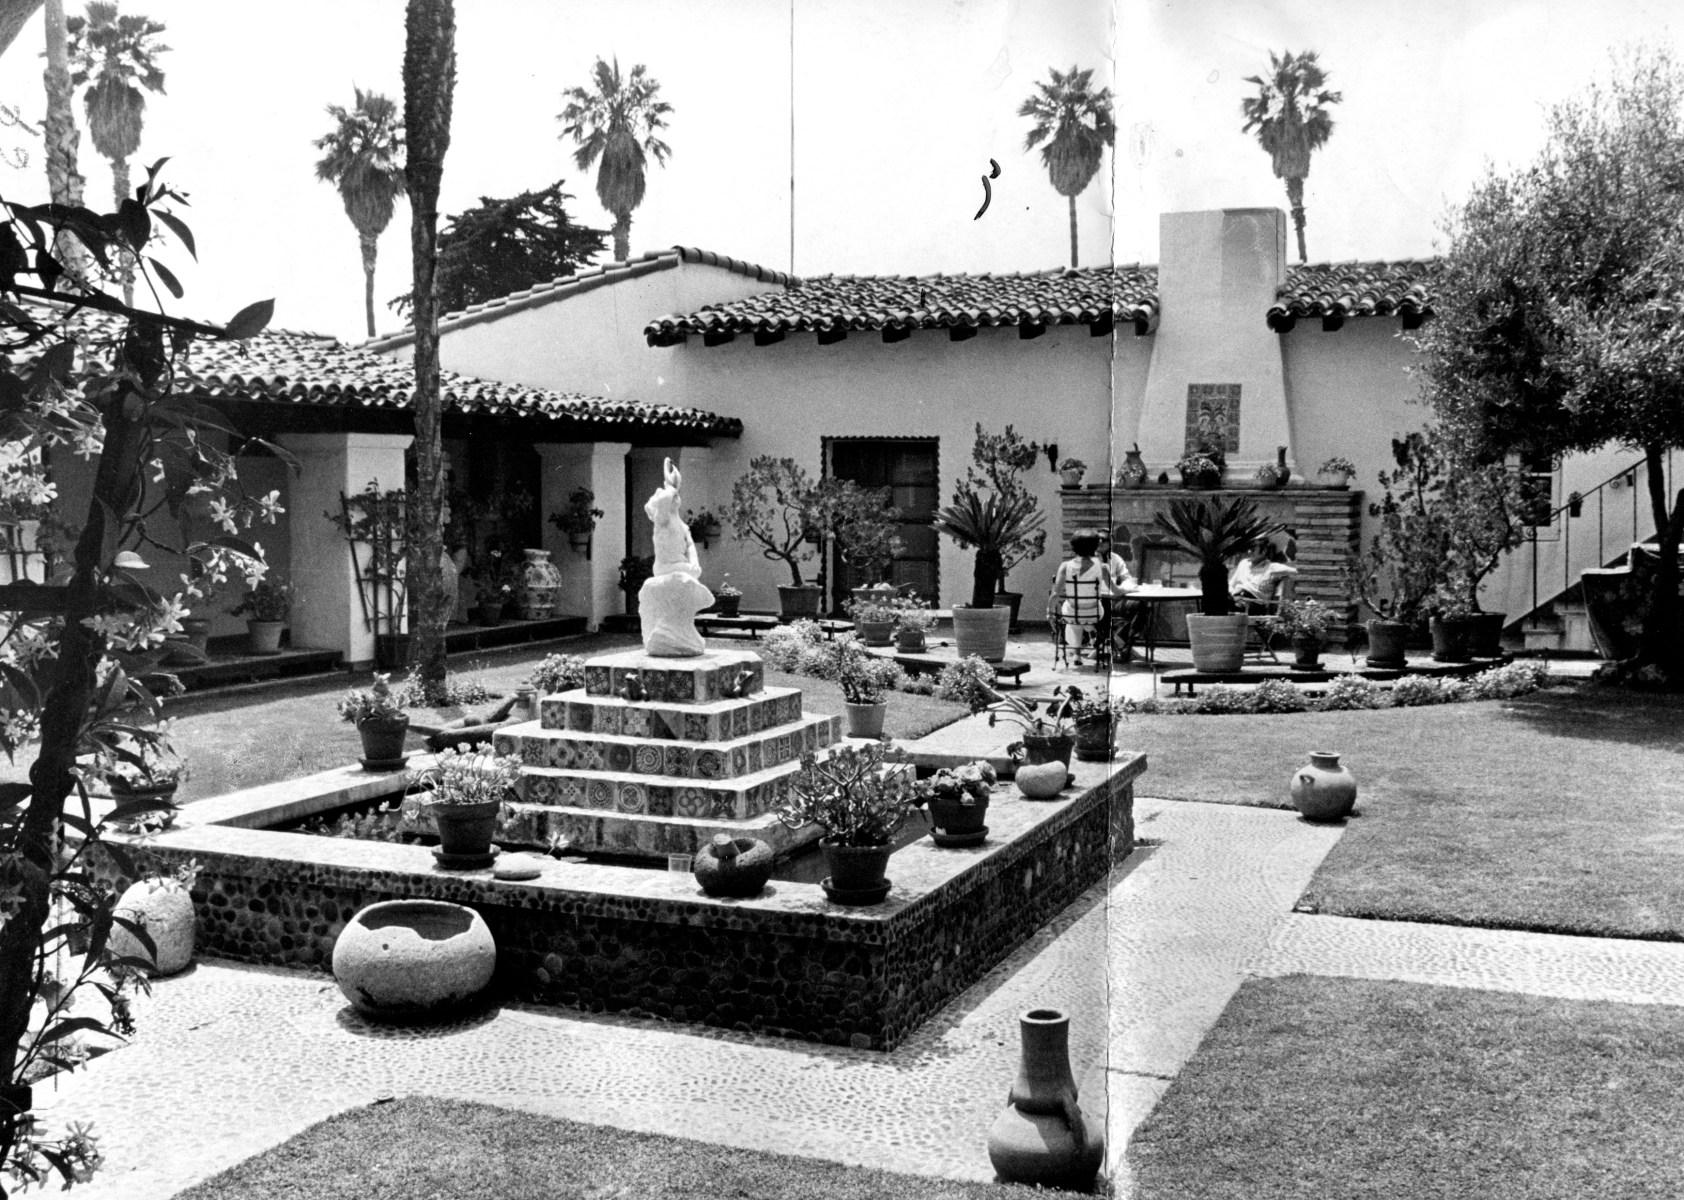 Nixon's Western White House